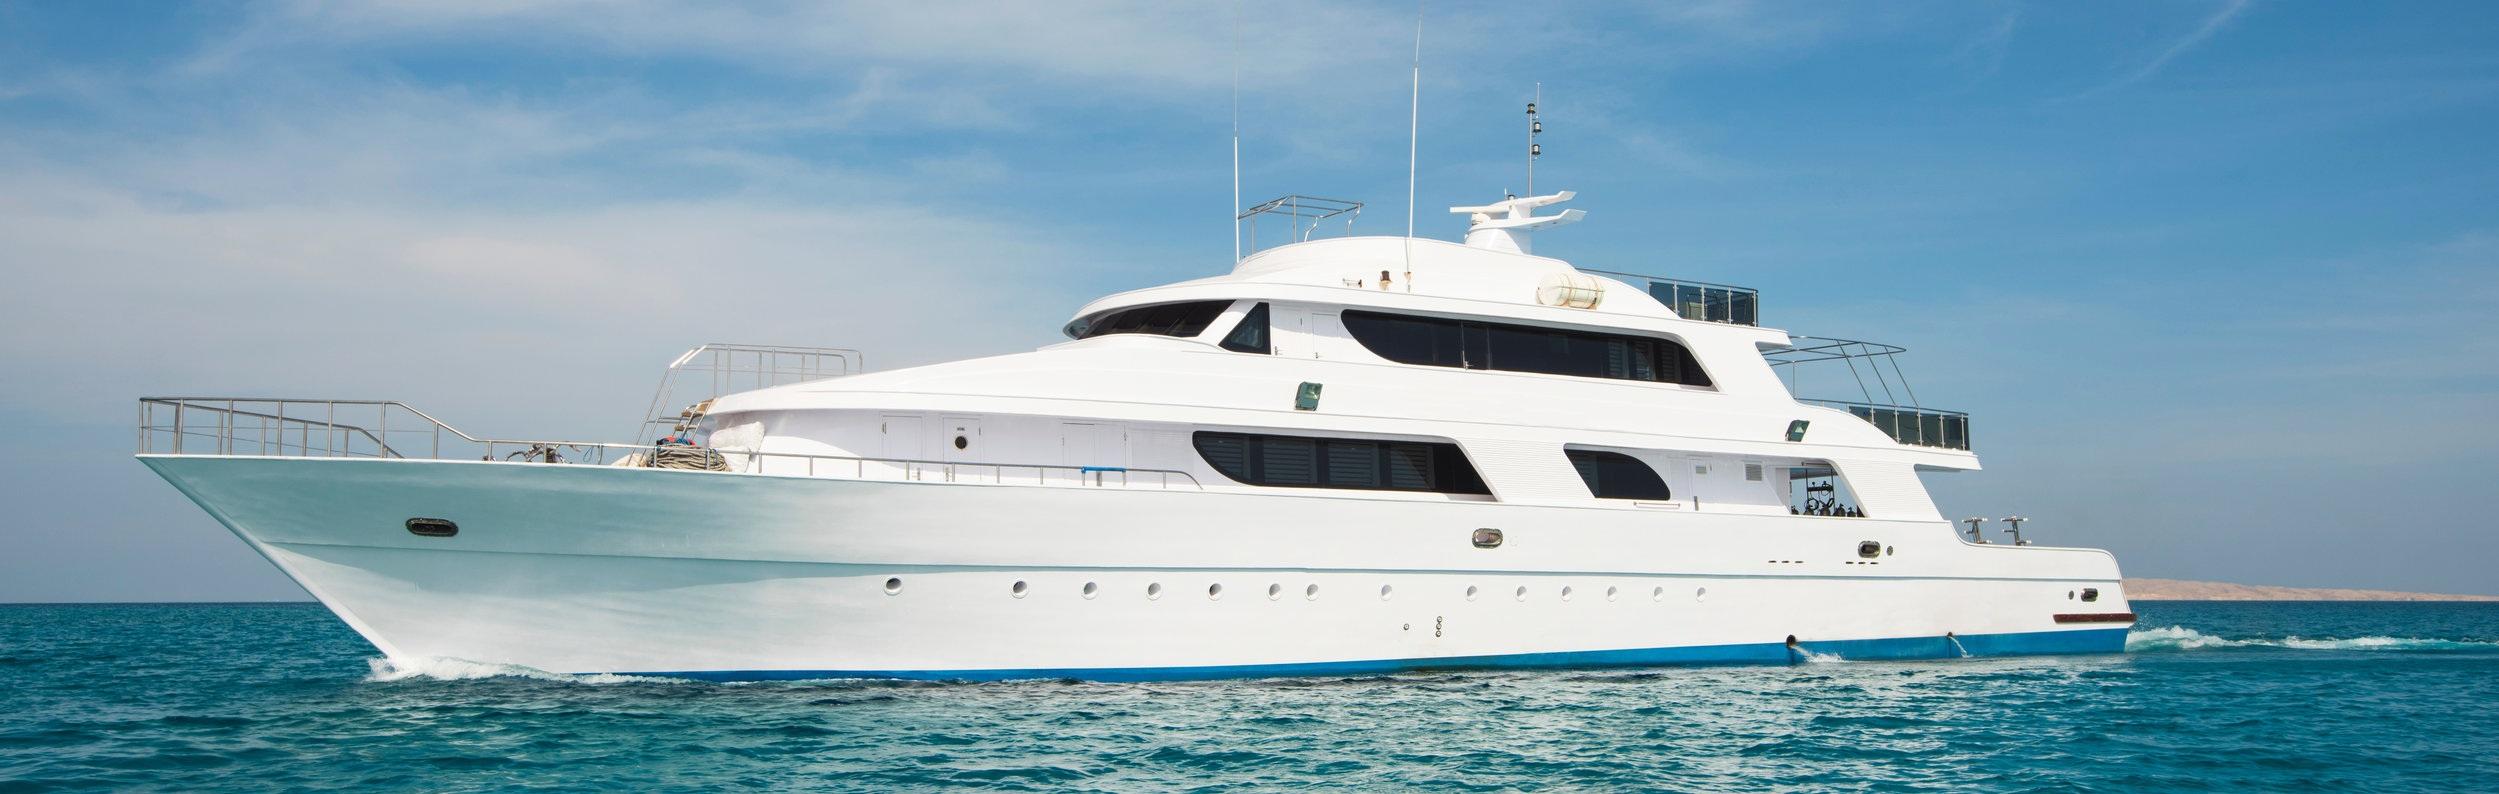 yacht_insurance _Marine_Insurance_House